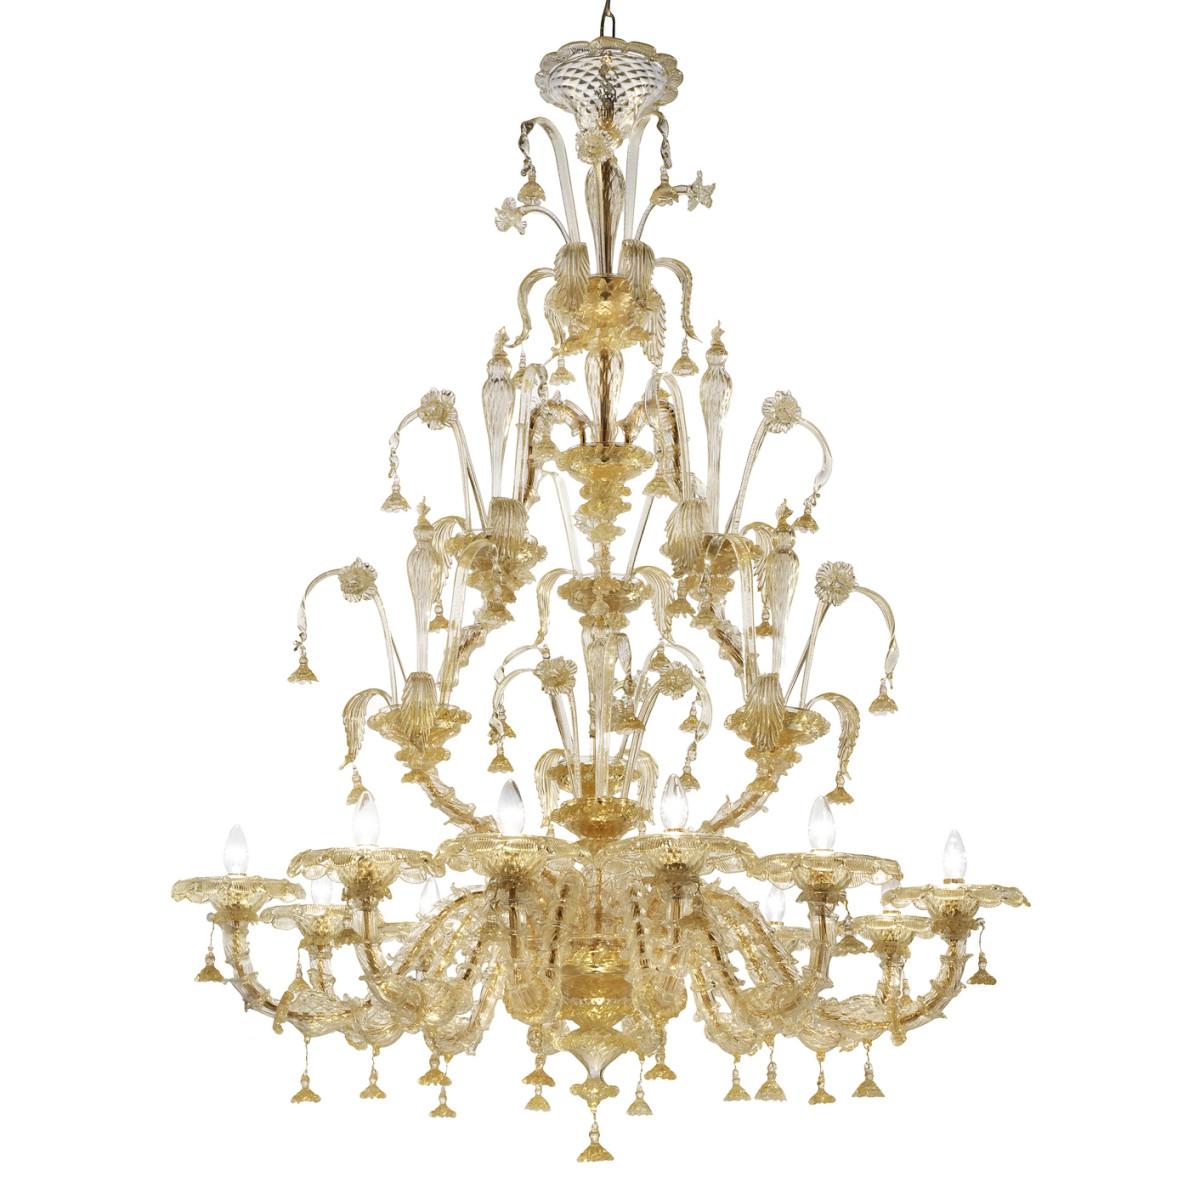 Magnifico 12 lights Murano chandelier